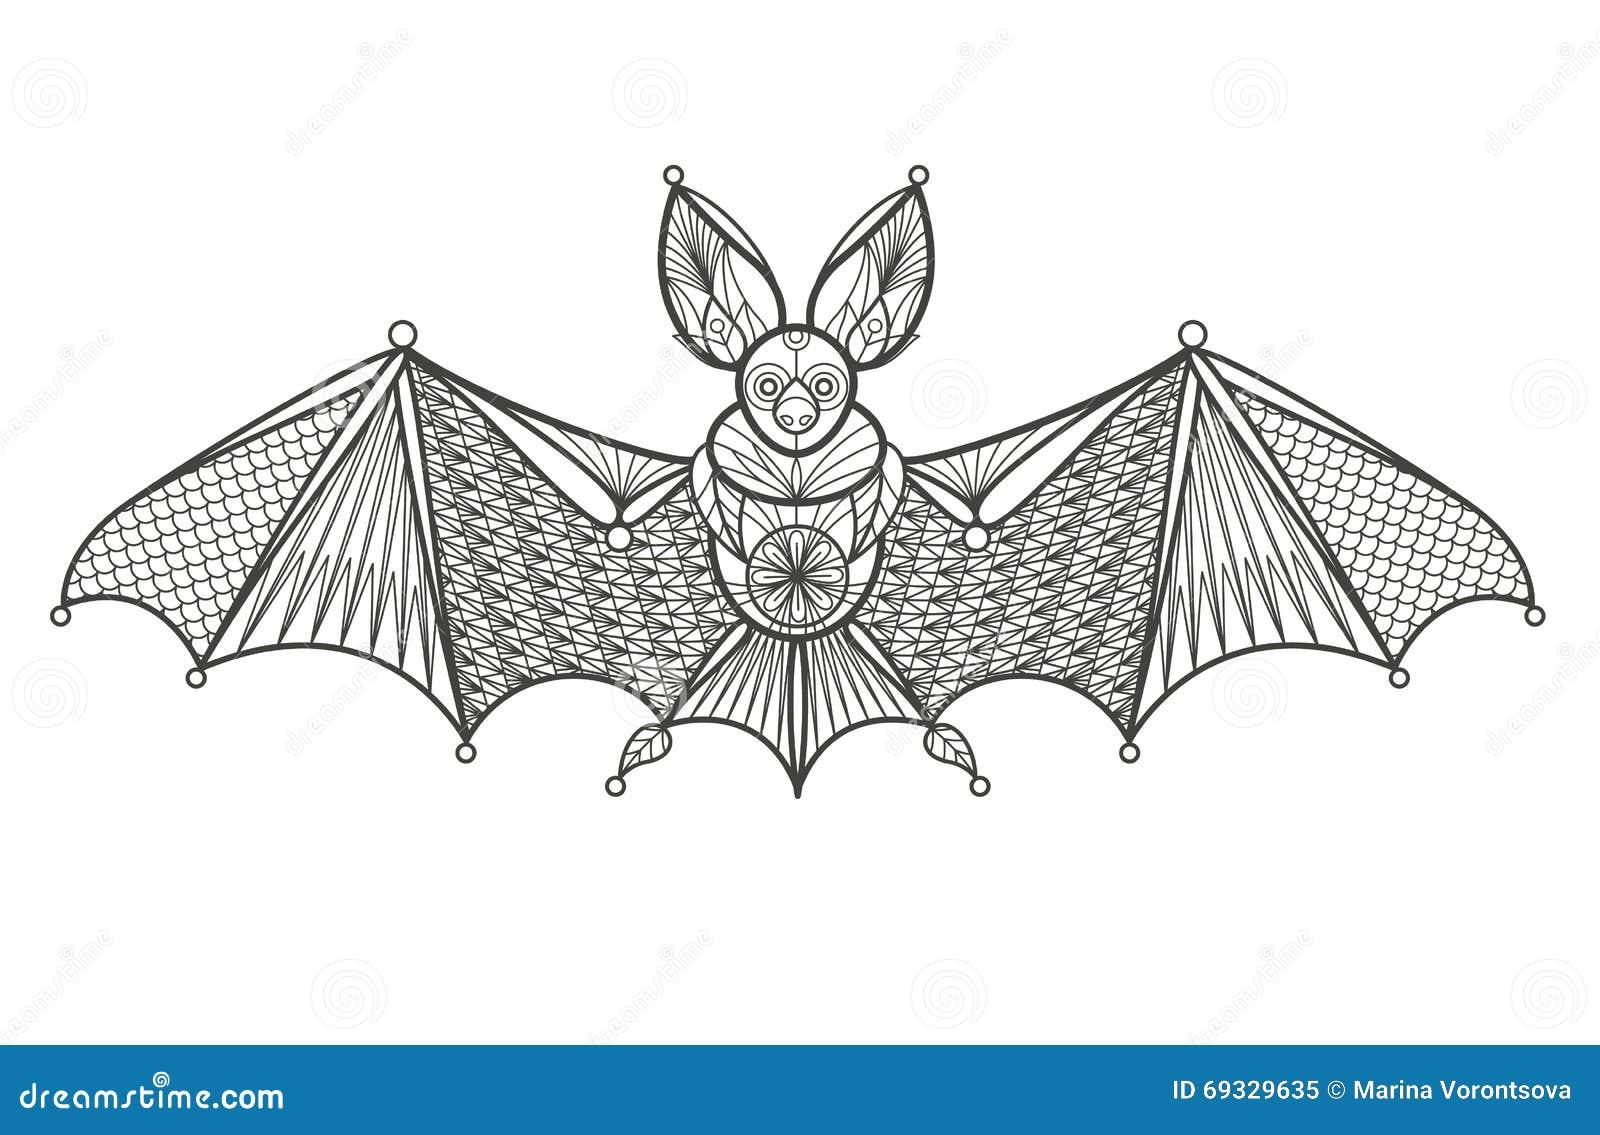 Adult Coloring Bat Stock Vector Image 69329635